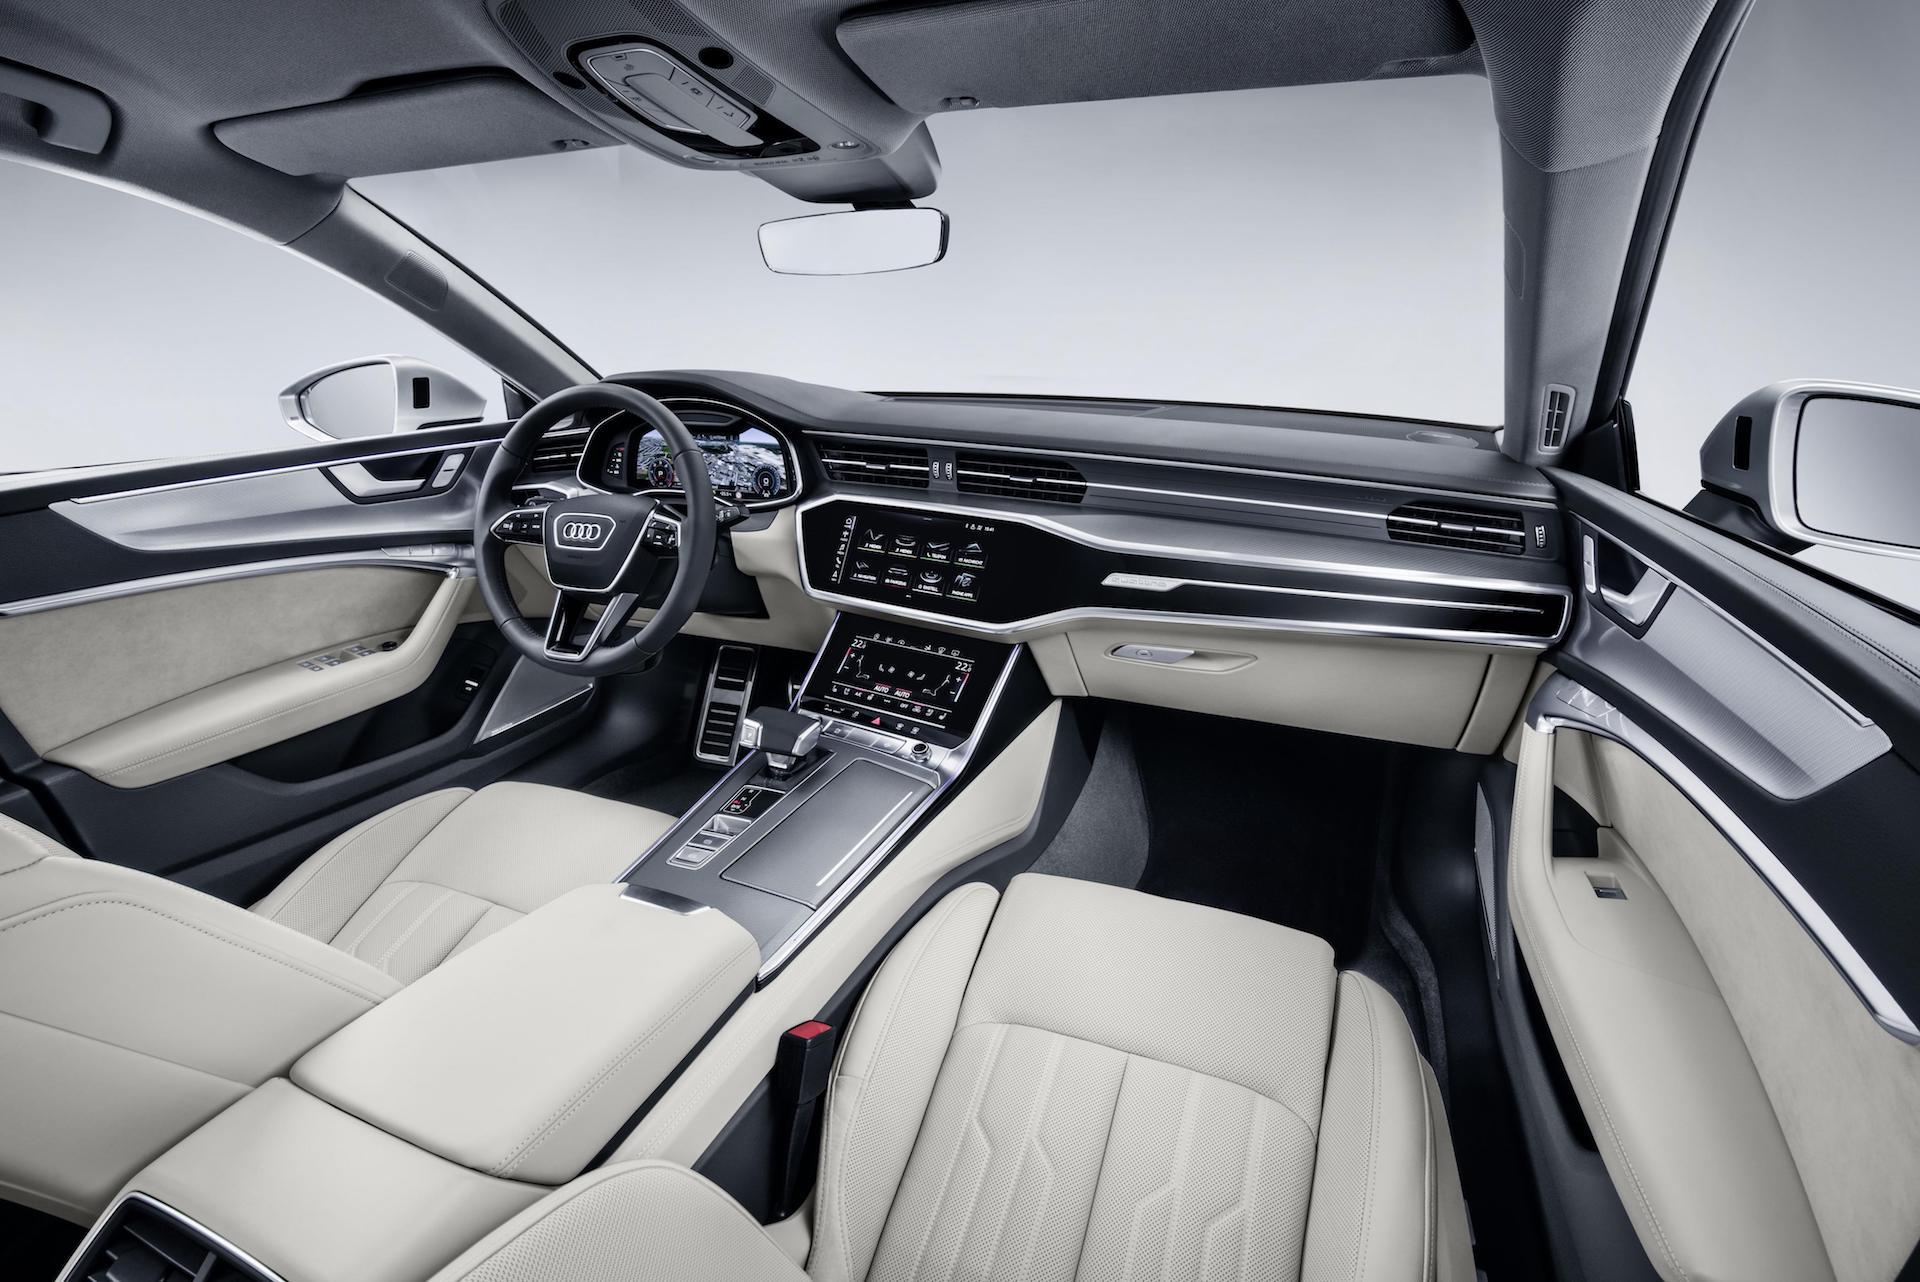 Audi A7 Sportback interior, October 2017